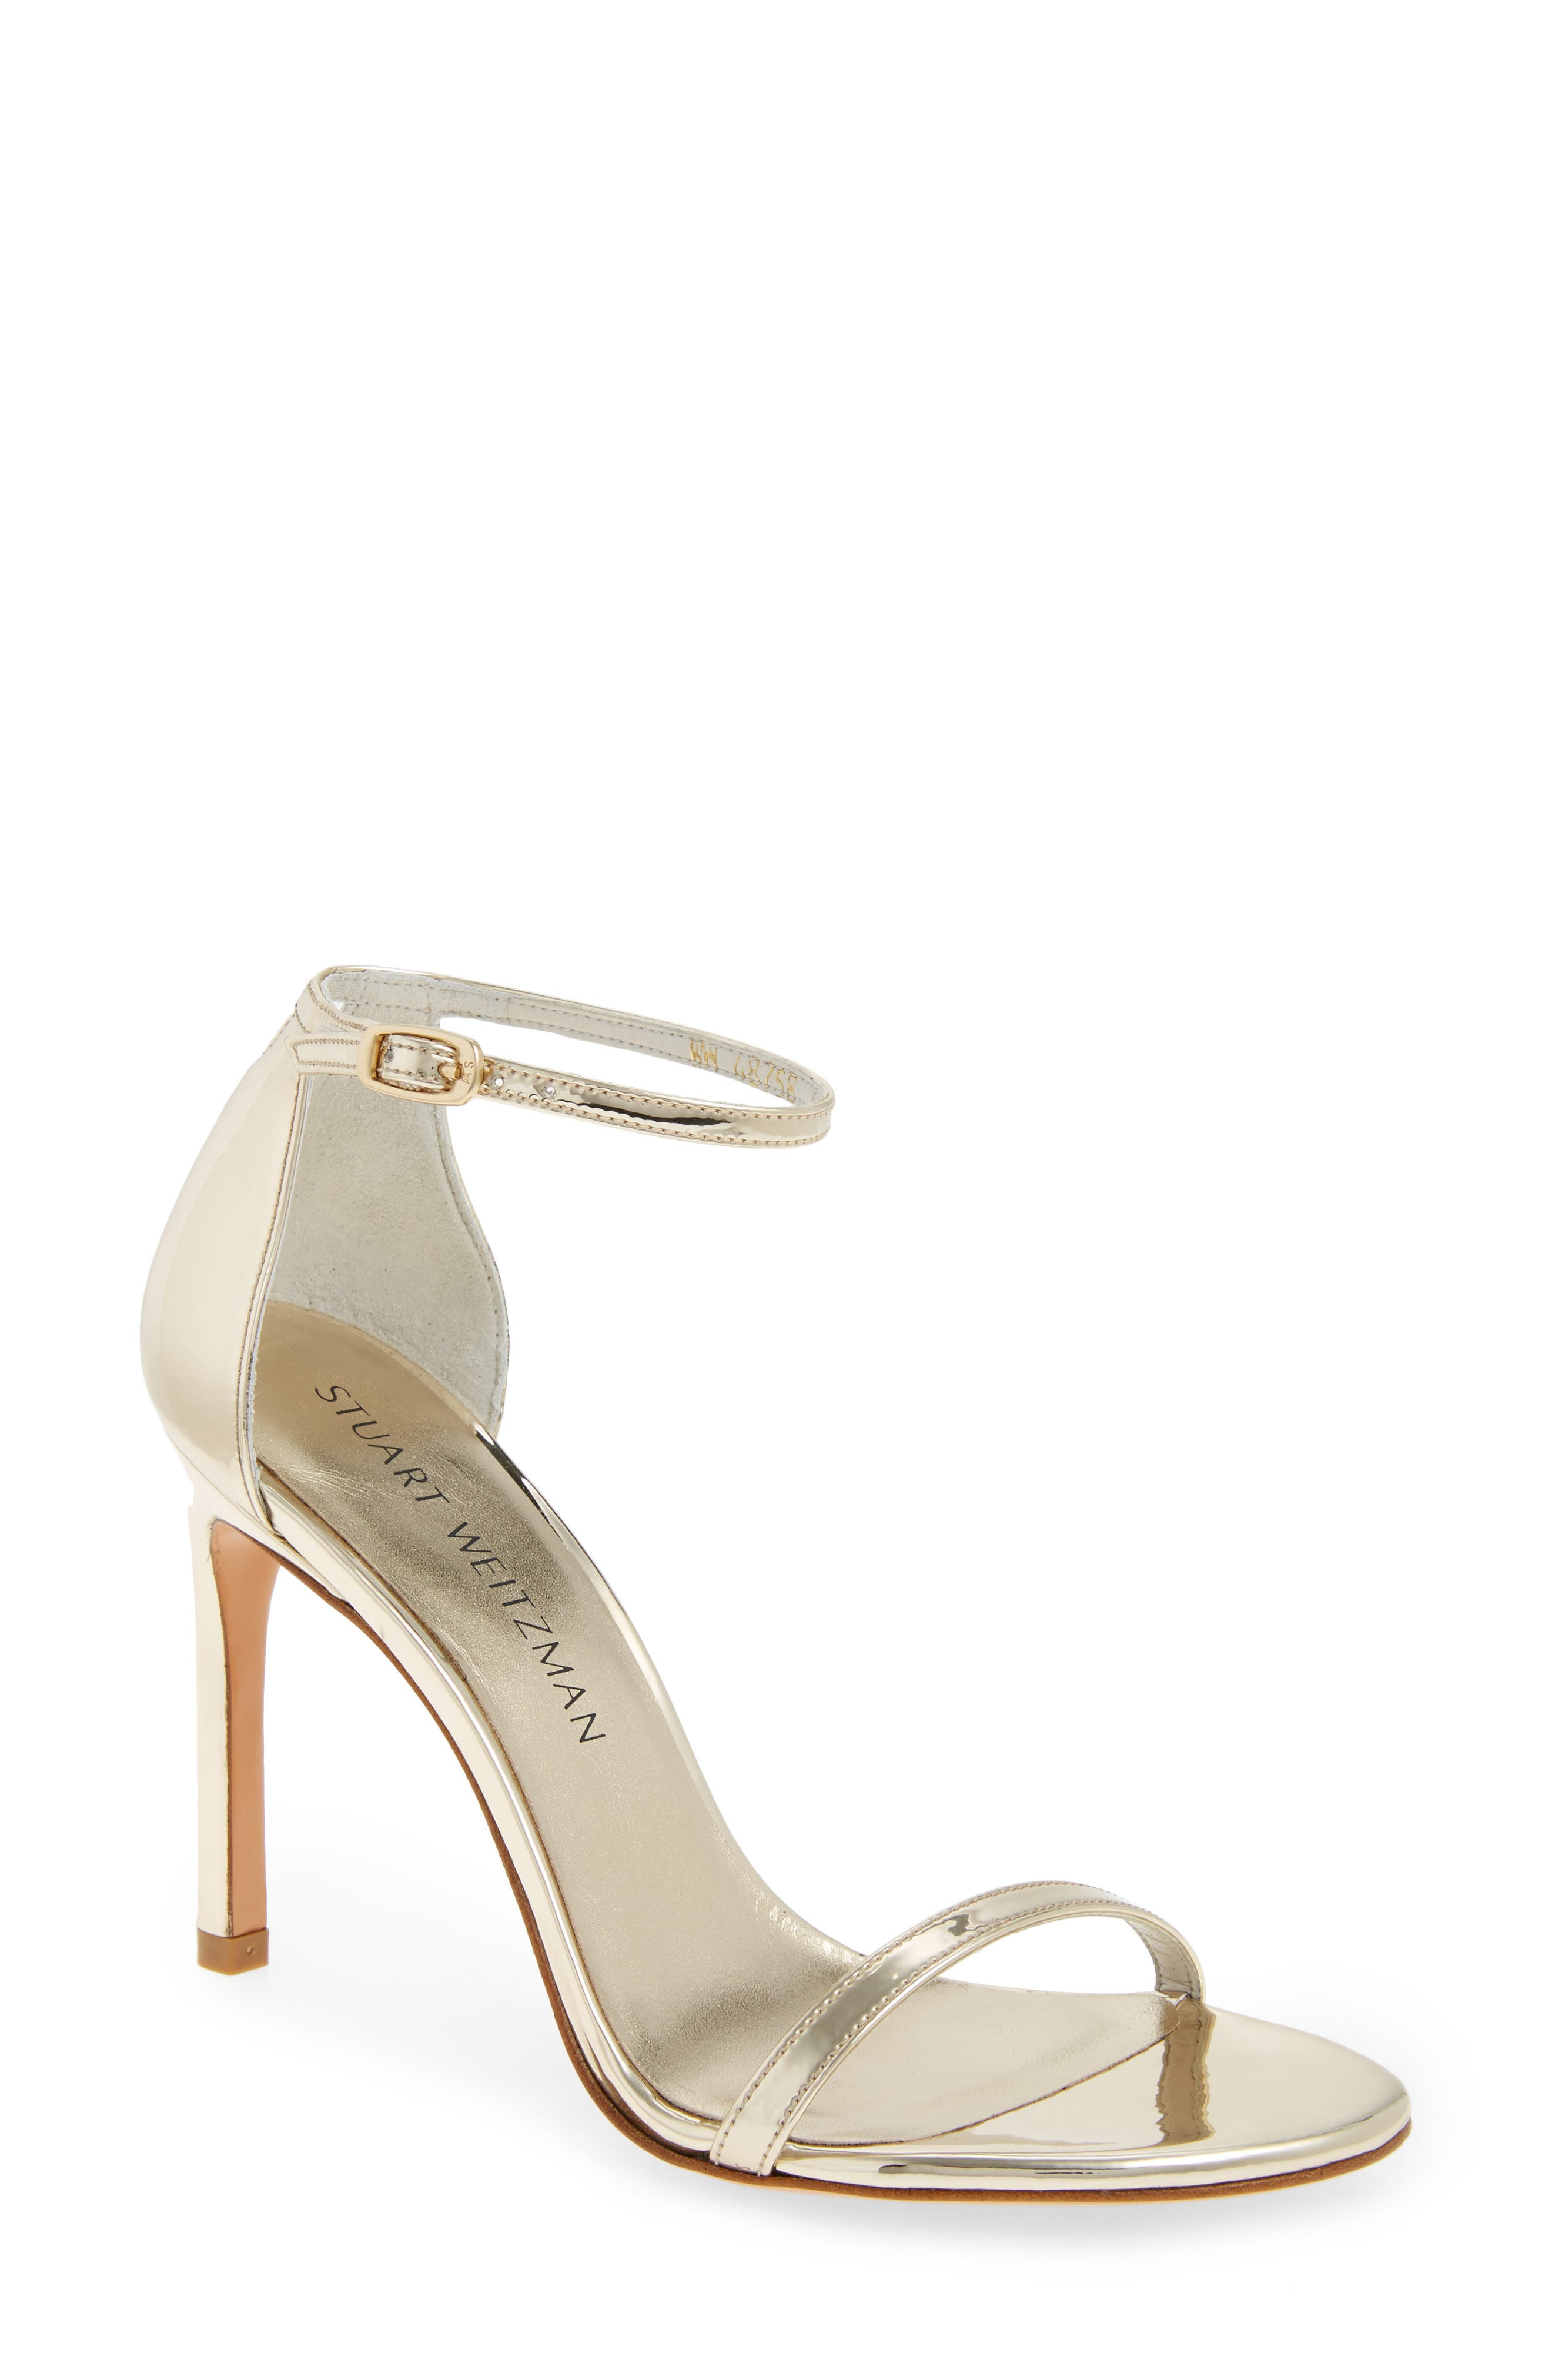 Main Image - Stuart Weitzman Nudistsong Ankle Strap Sandal (Women)